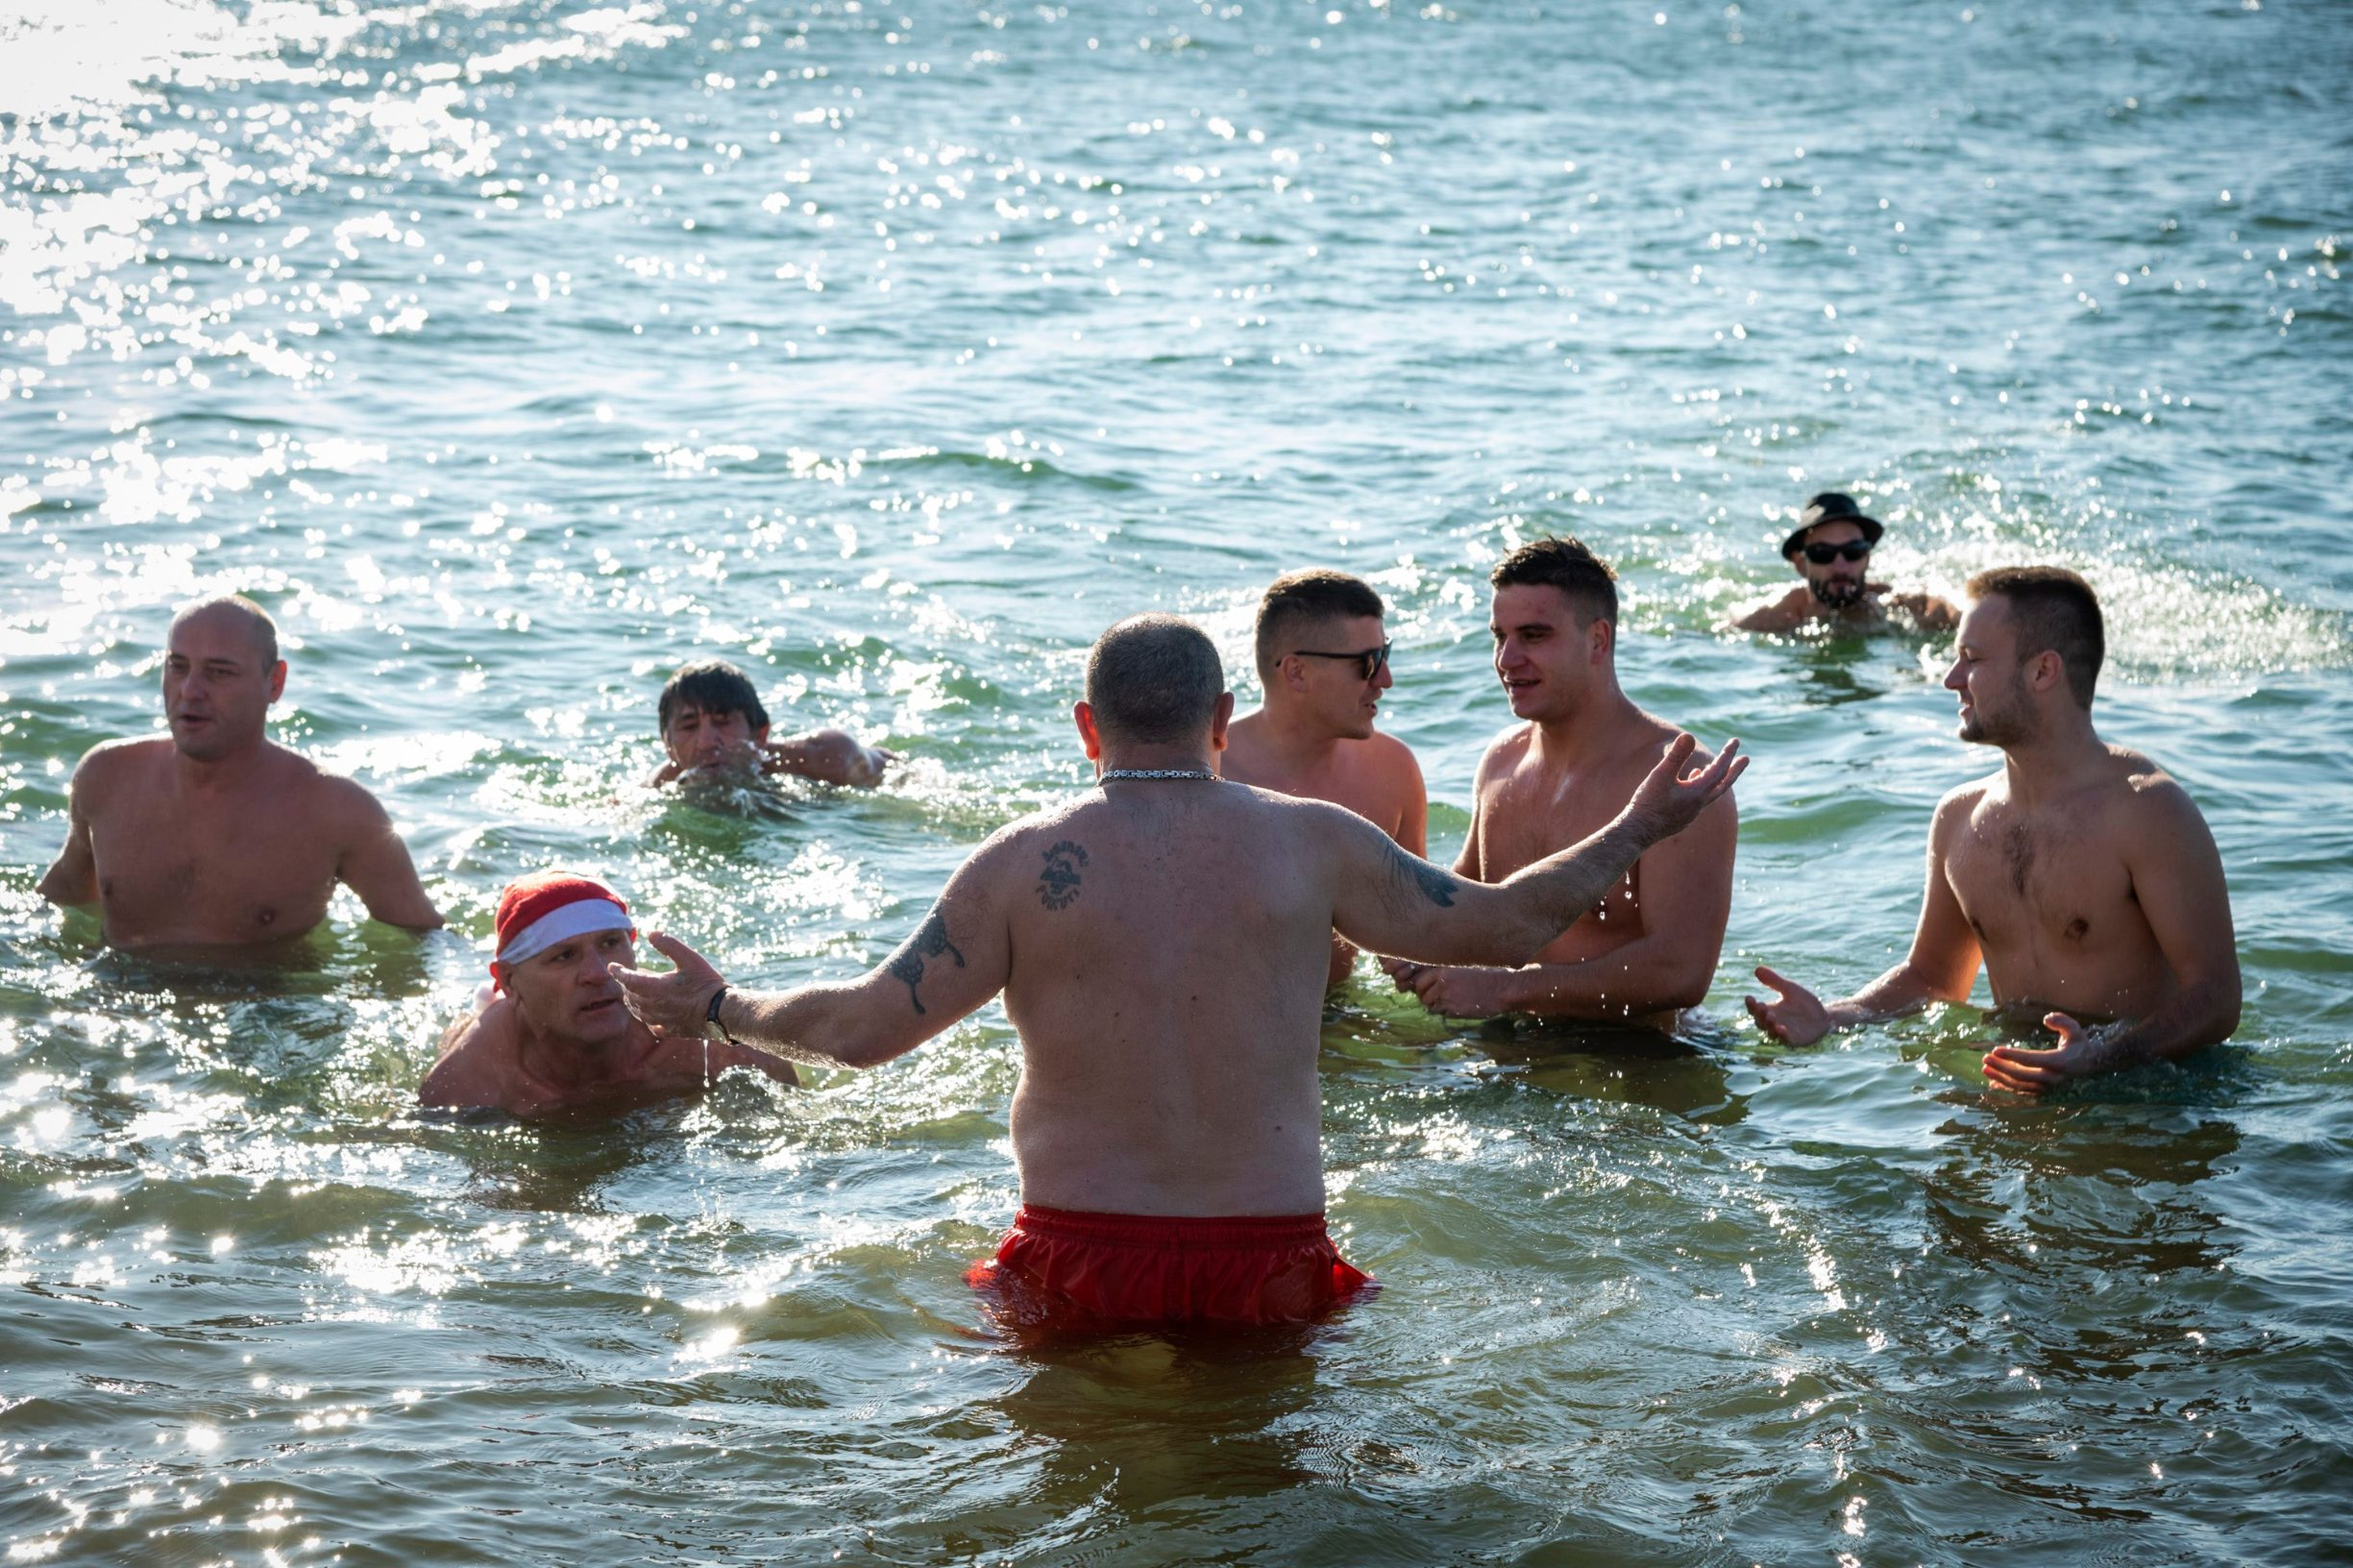 kupanje_banj07-010120